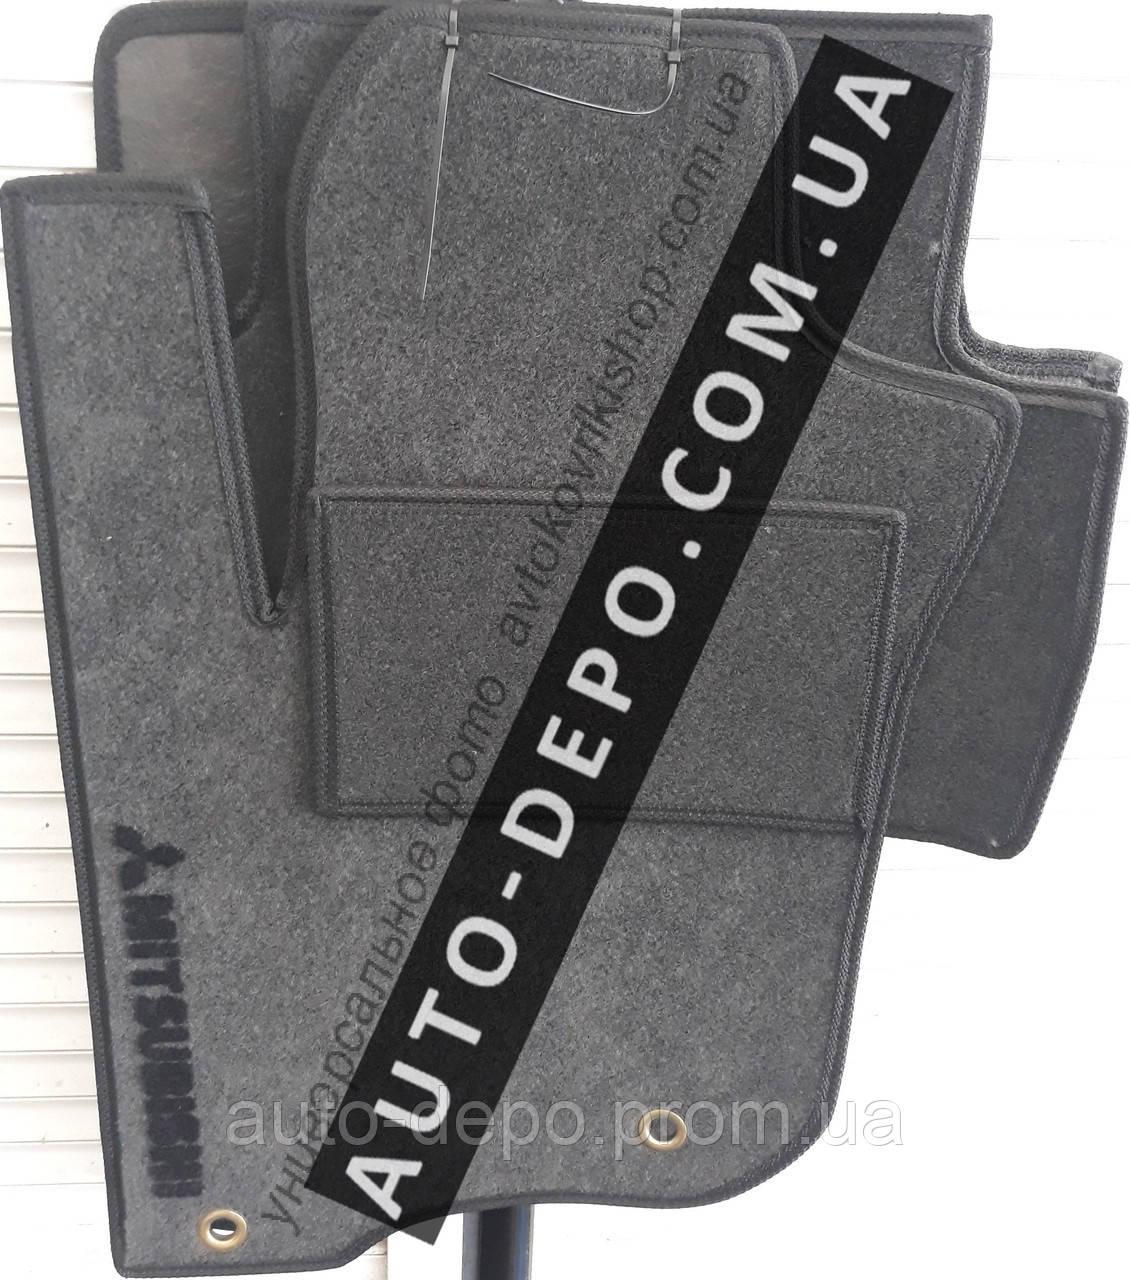 Ворсовые коврики Mitsubishi Colt 2002-2009 VIP ЛЮКС АВТО-ВОРС